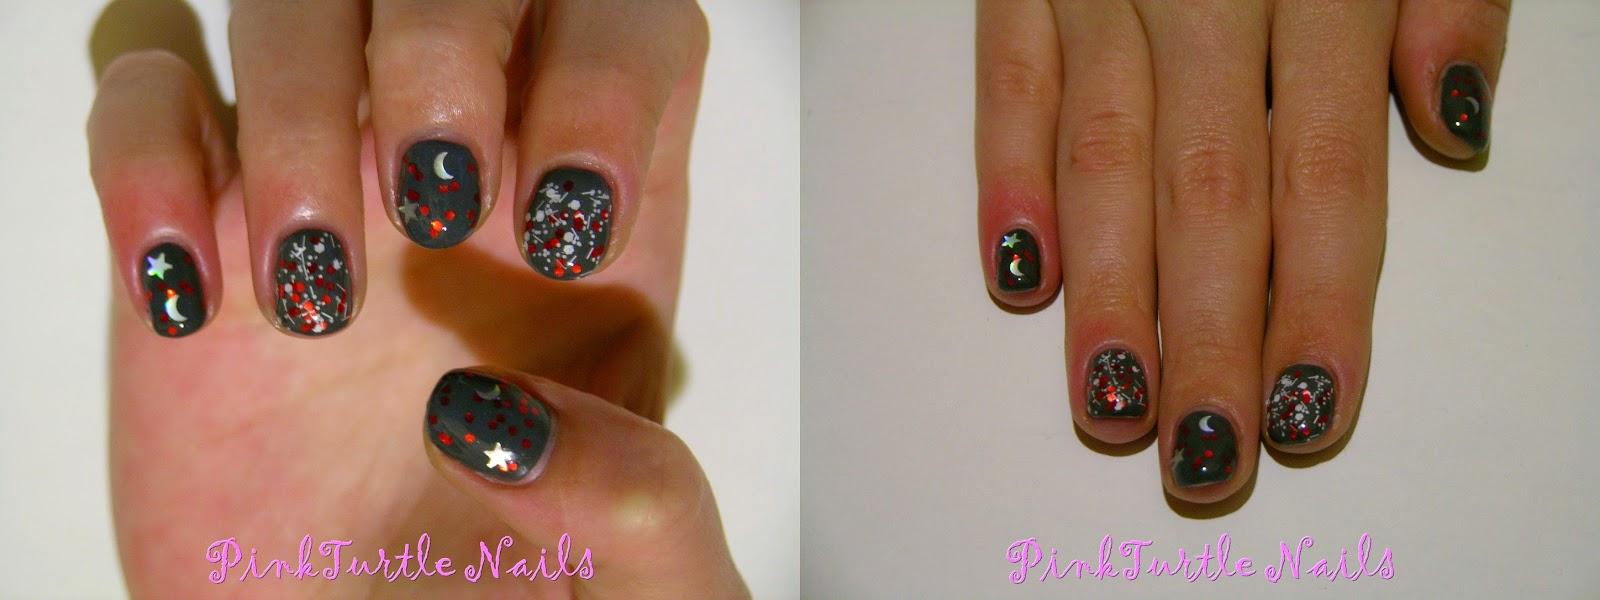 http://pinkturtlenails.blogspot.com.es/2015/03/reto-31-dias-purpurina.html